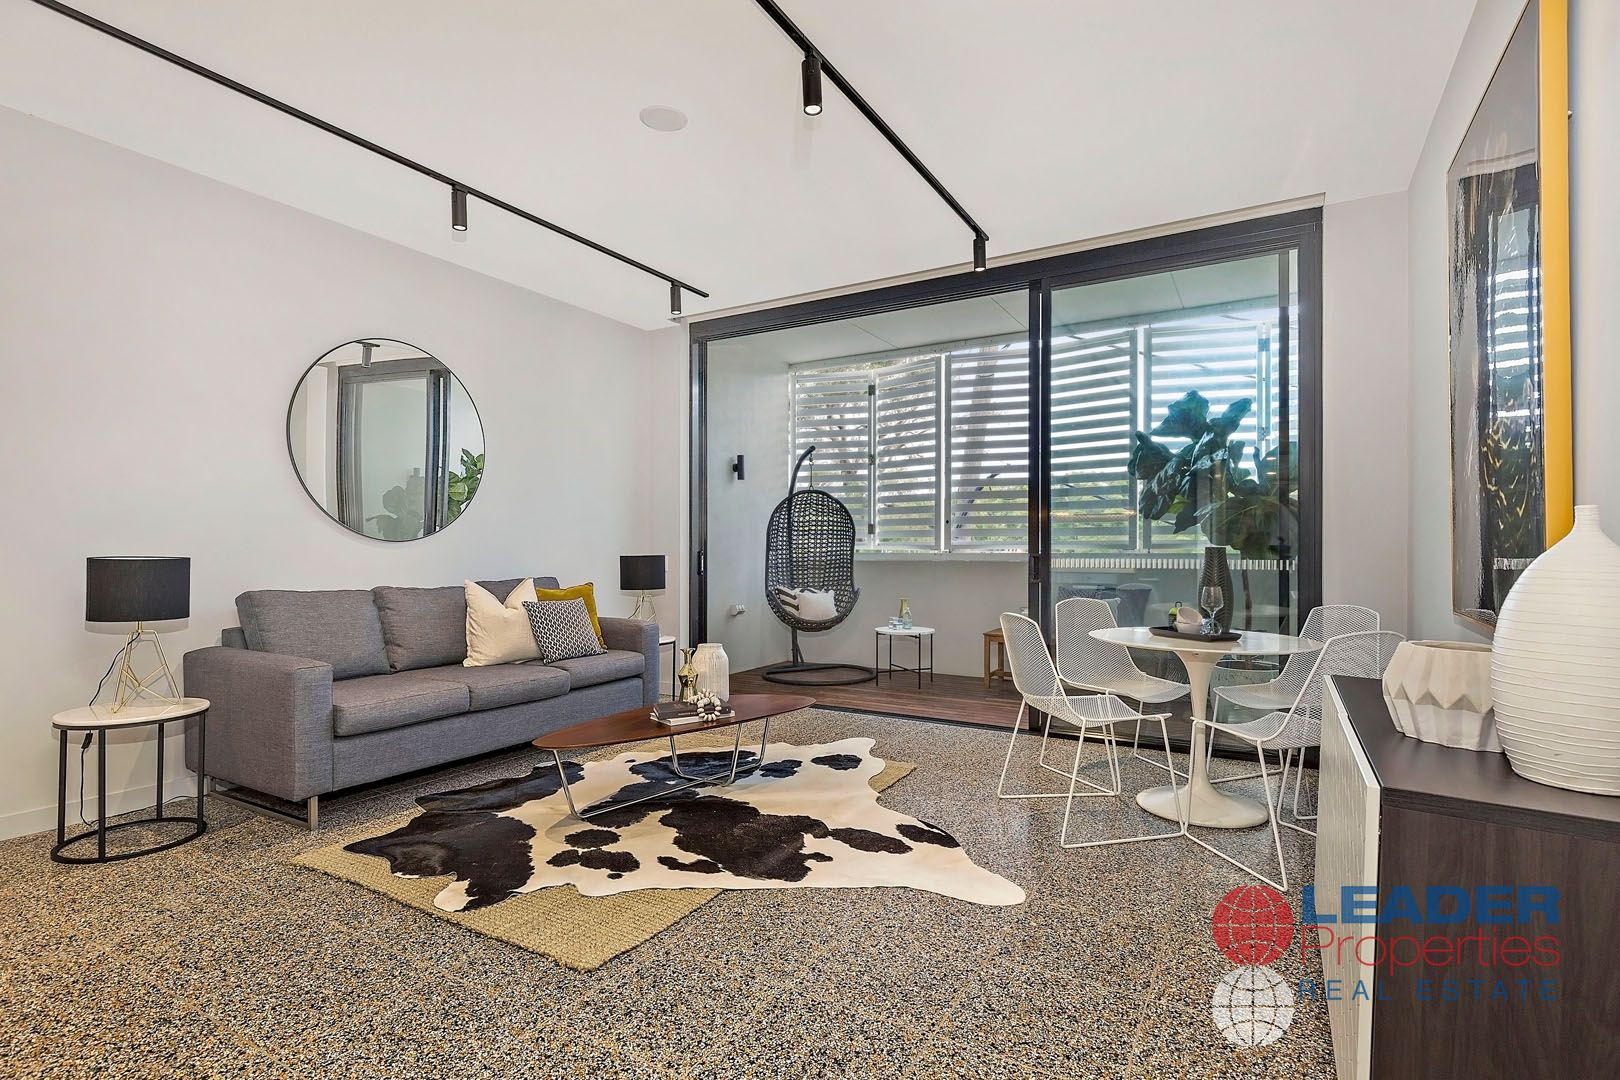 14/15-19 Erskineville  Road, Newtown NSW 2042, Image 1